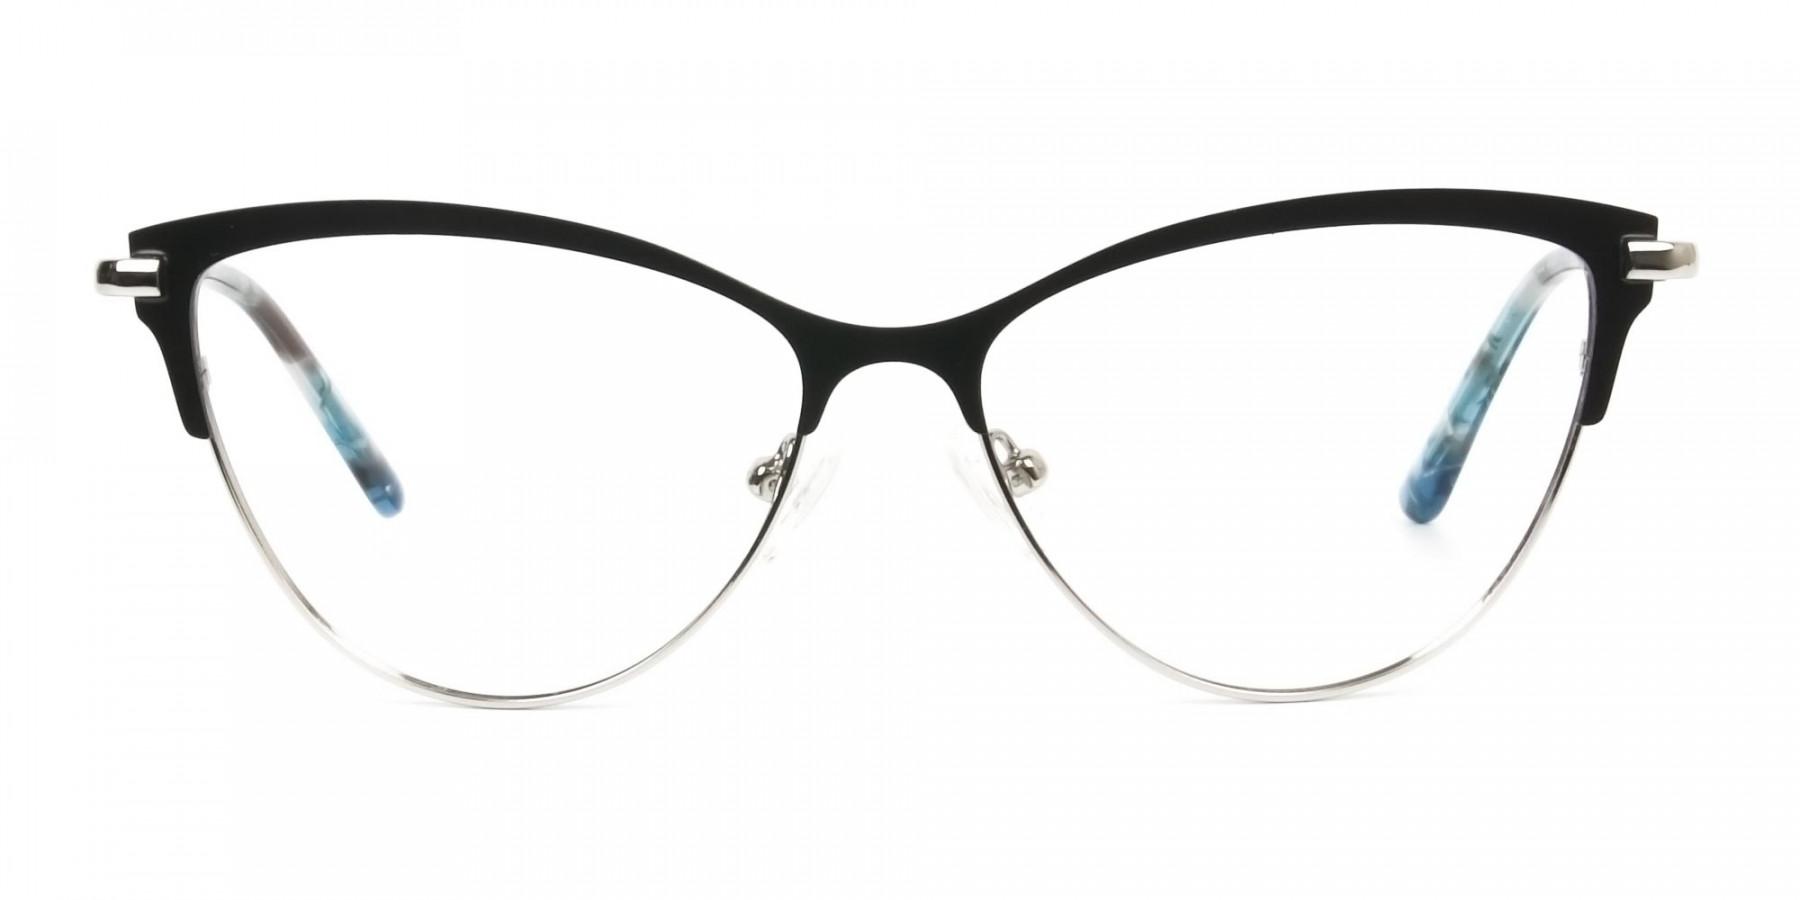 Silver & Black Cat Eye Browline Glasses - 1